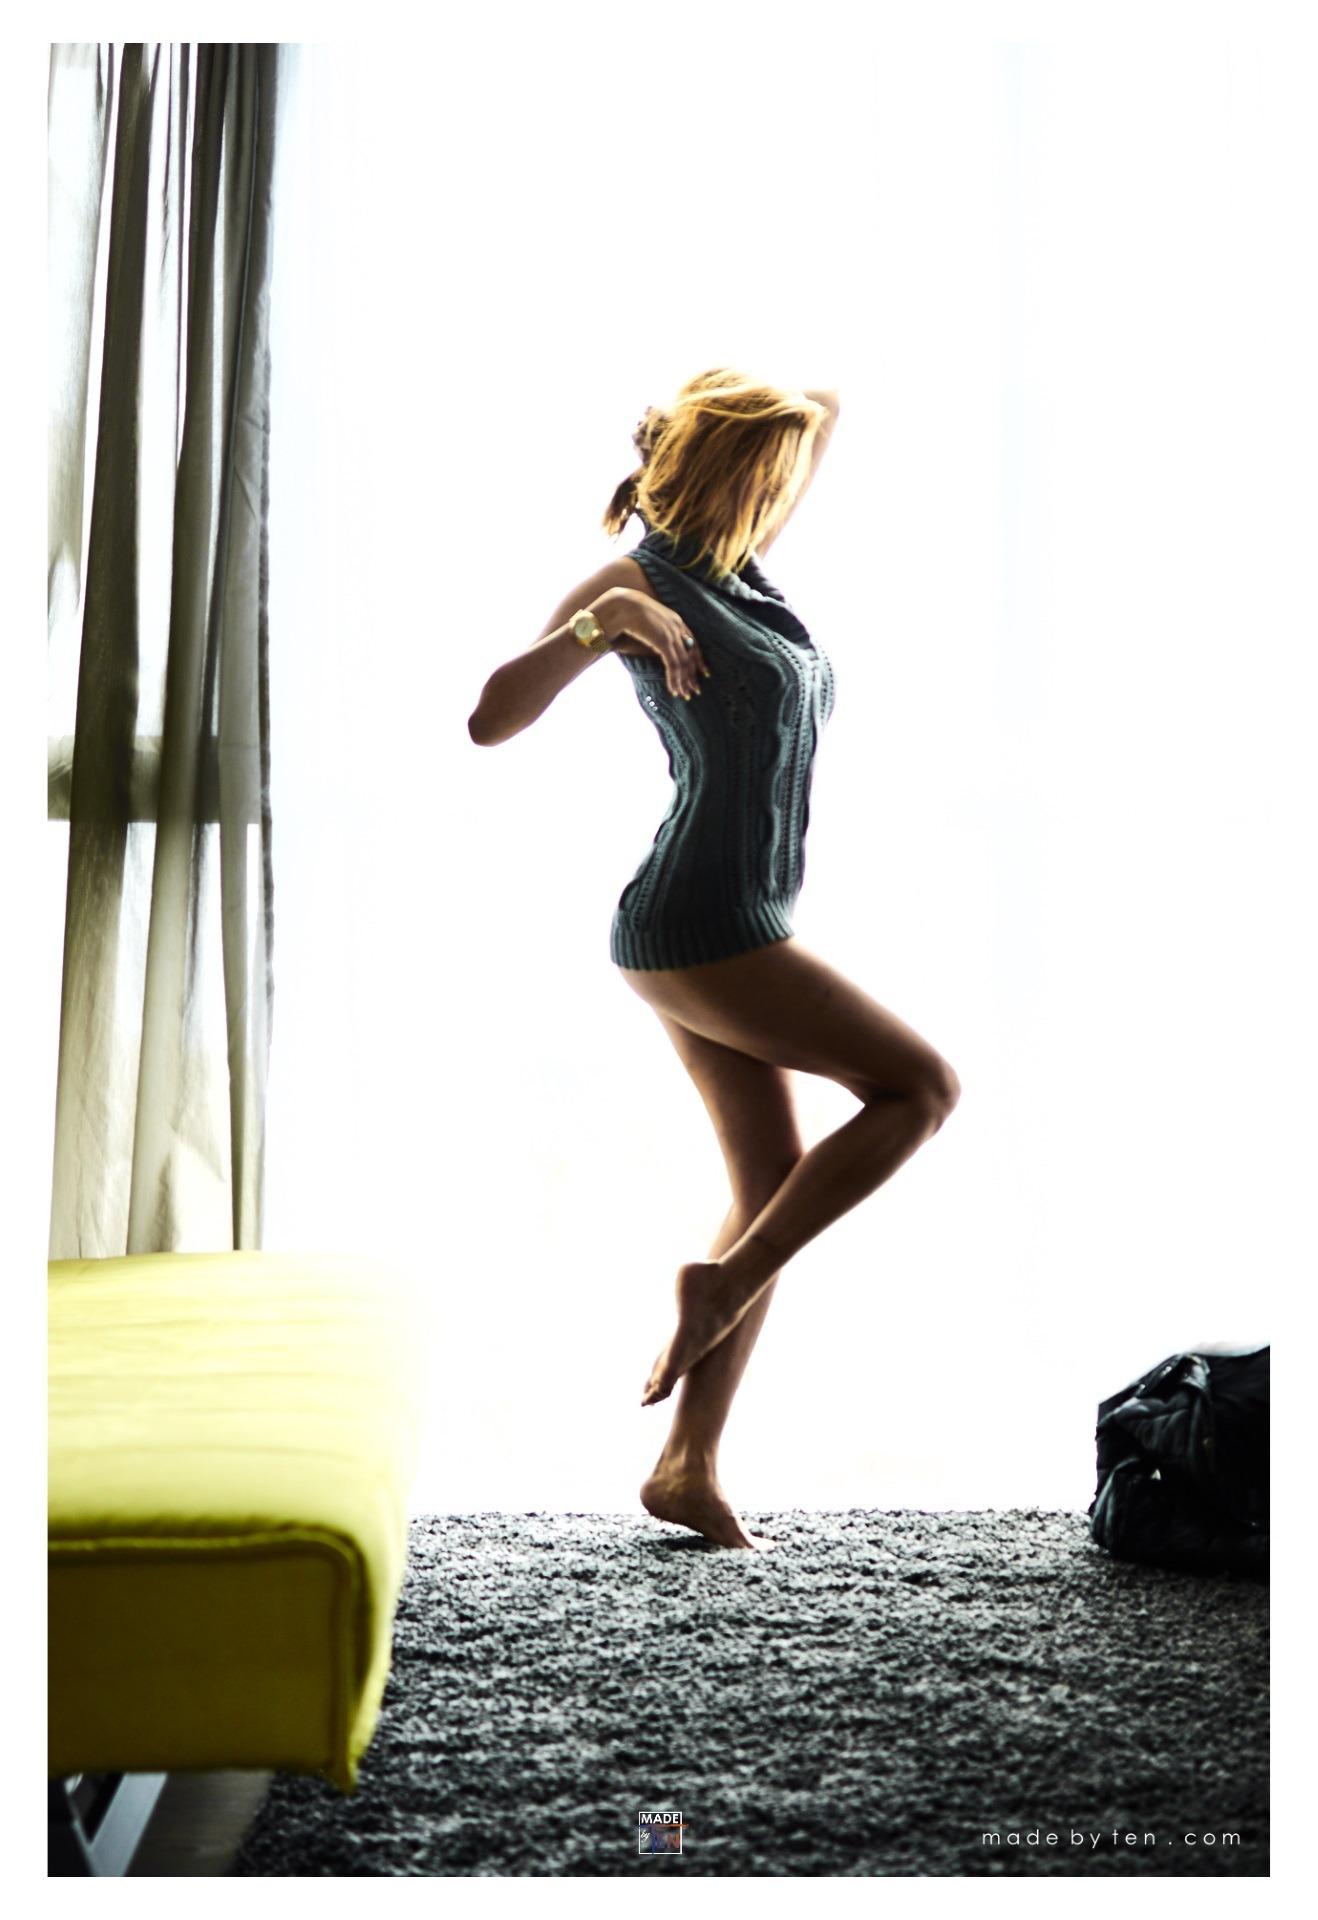 Modern Boudoir Photography  Made by Ten